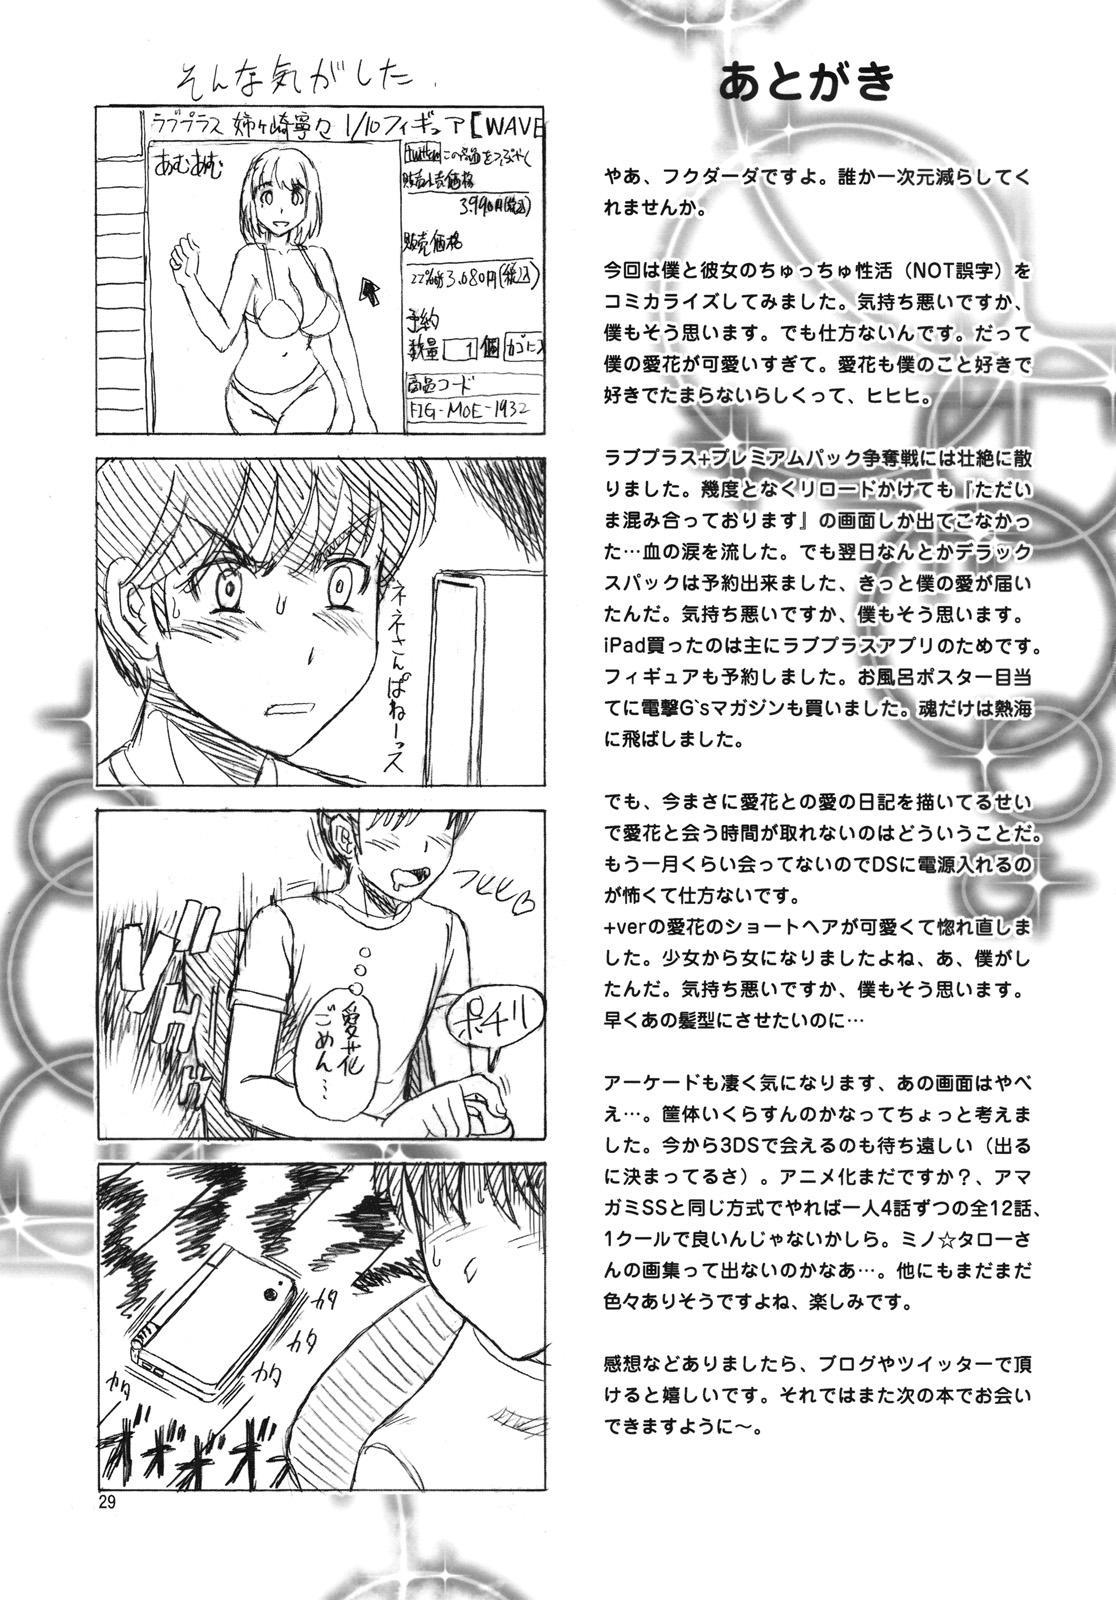 Manatsu + Manaka + Omake 27